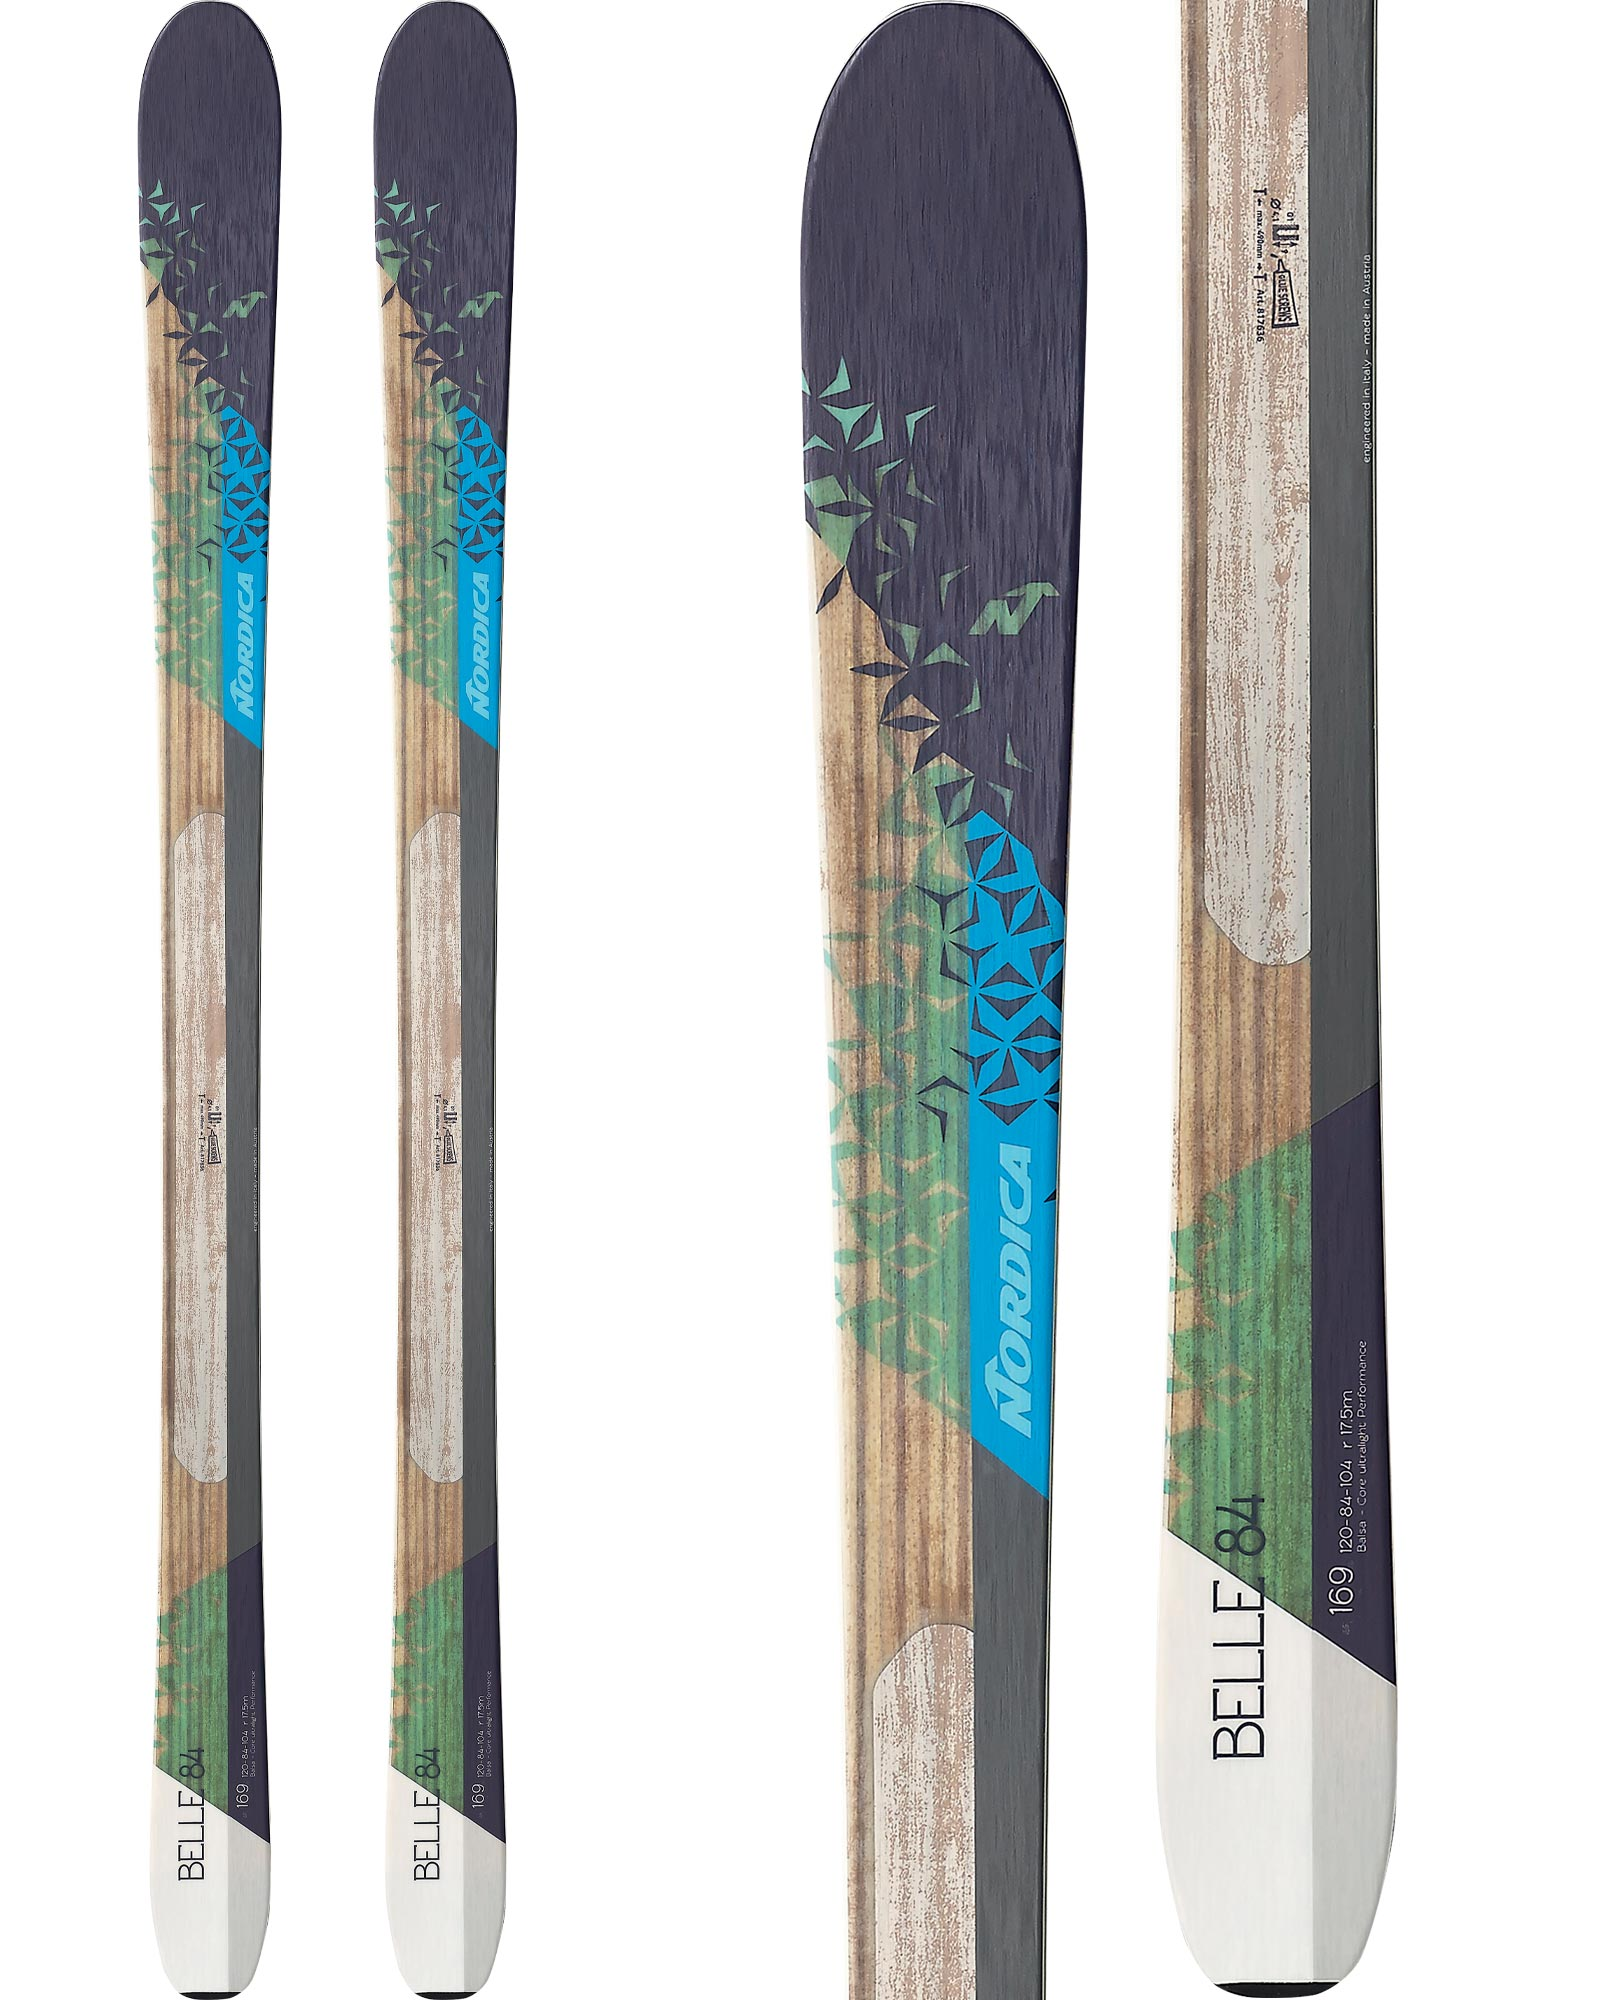 Nordica Women's Belle 84 All Mountain Skis 2016 / 2017 0